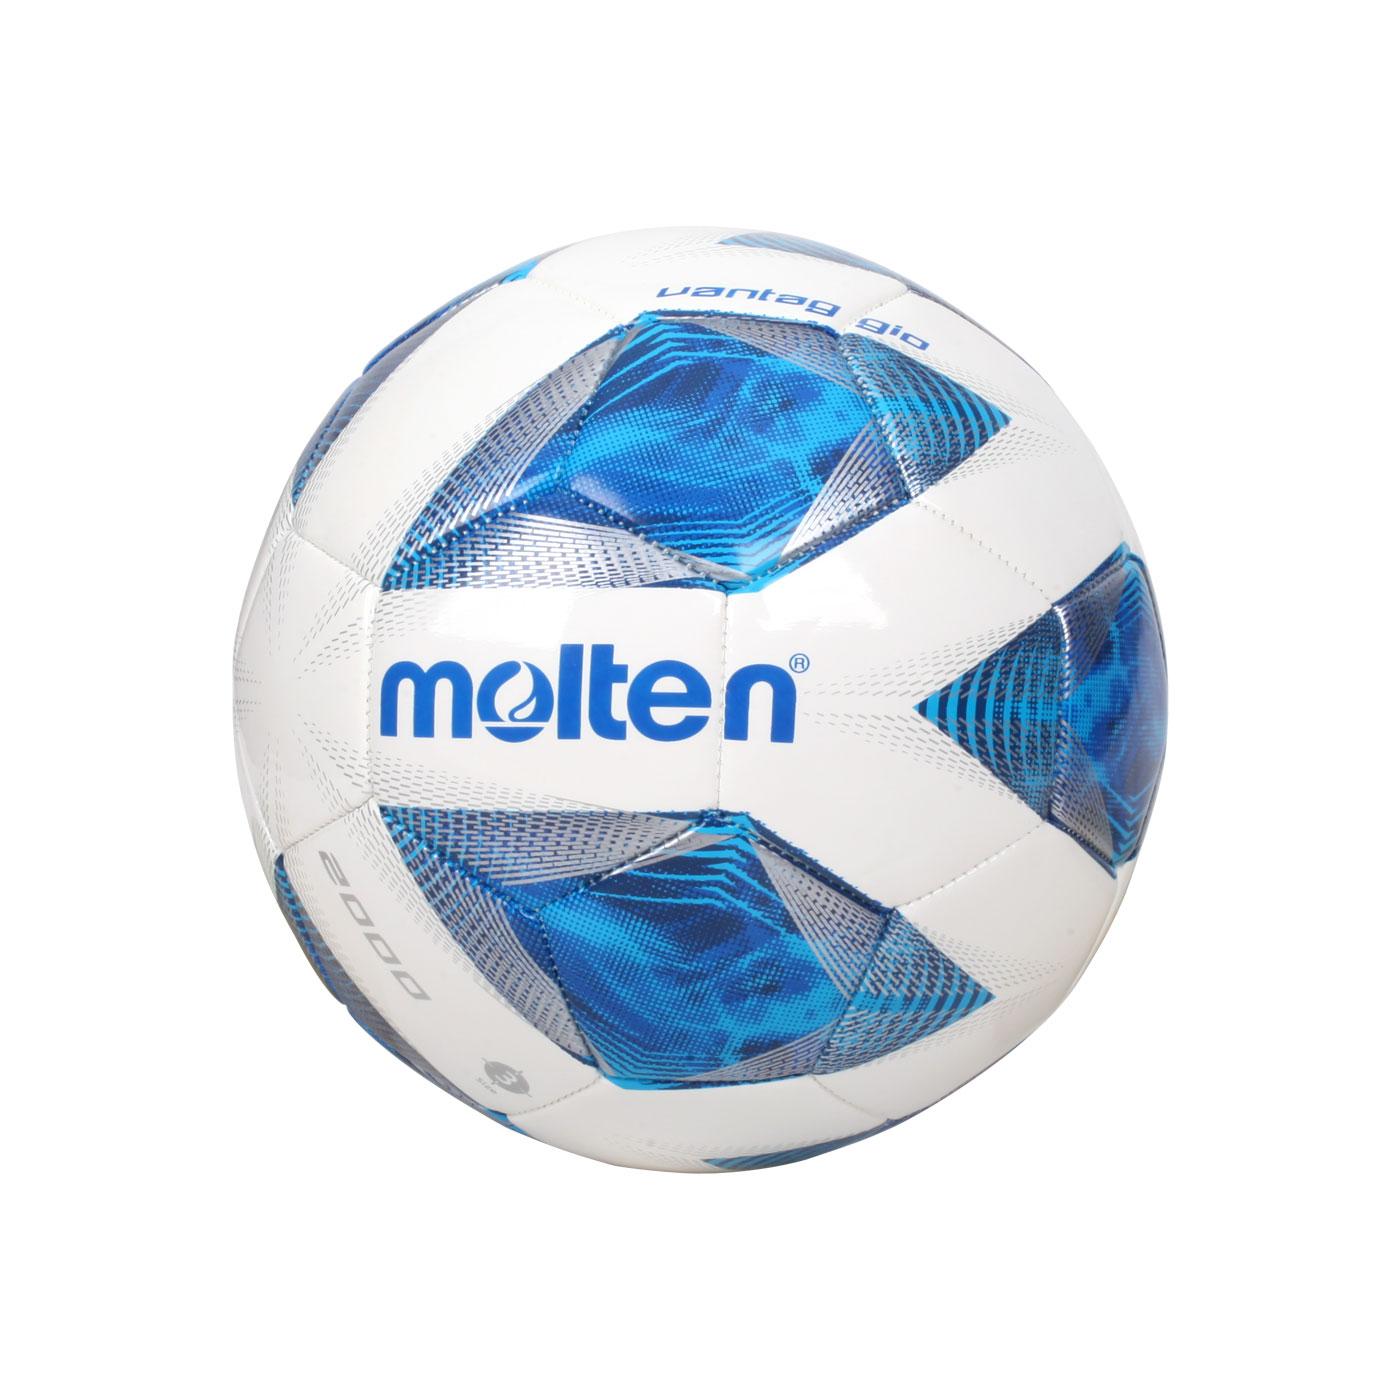 Molten #3合成皮足球 F3A2000 - 白藍銀